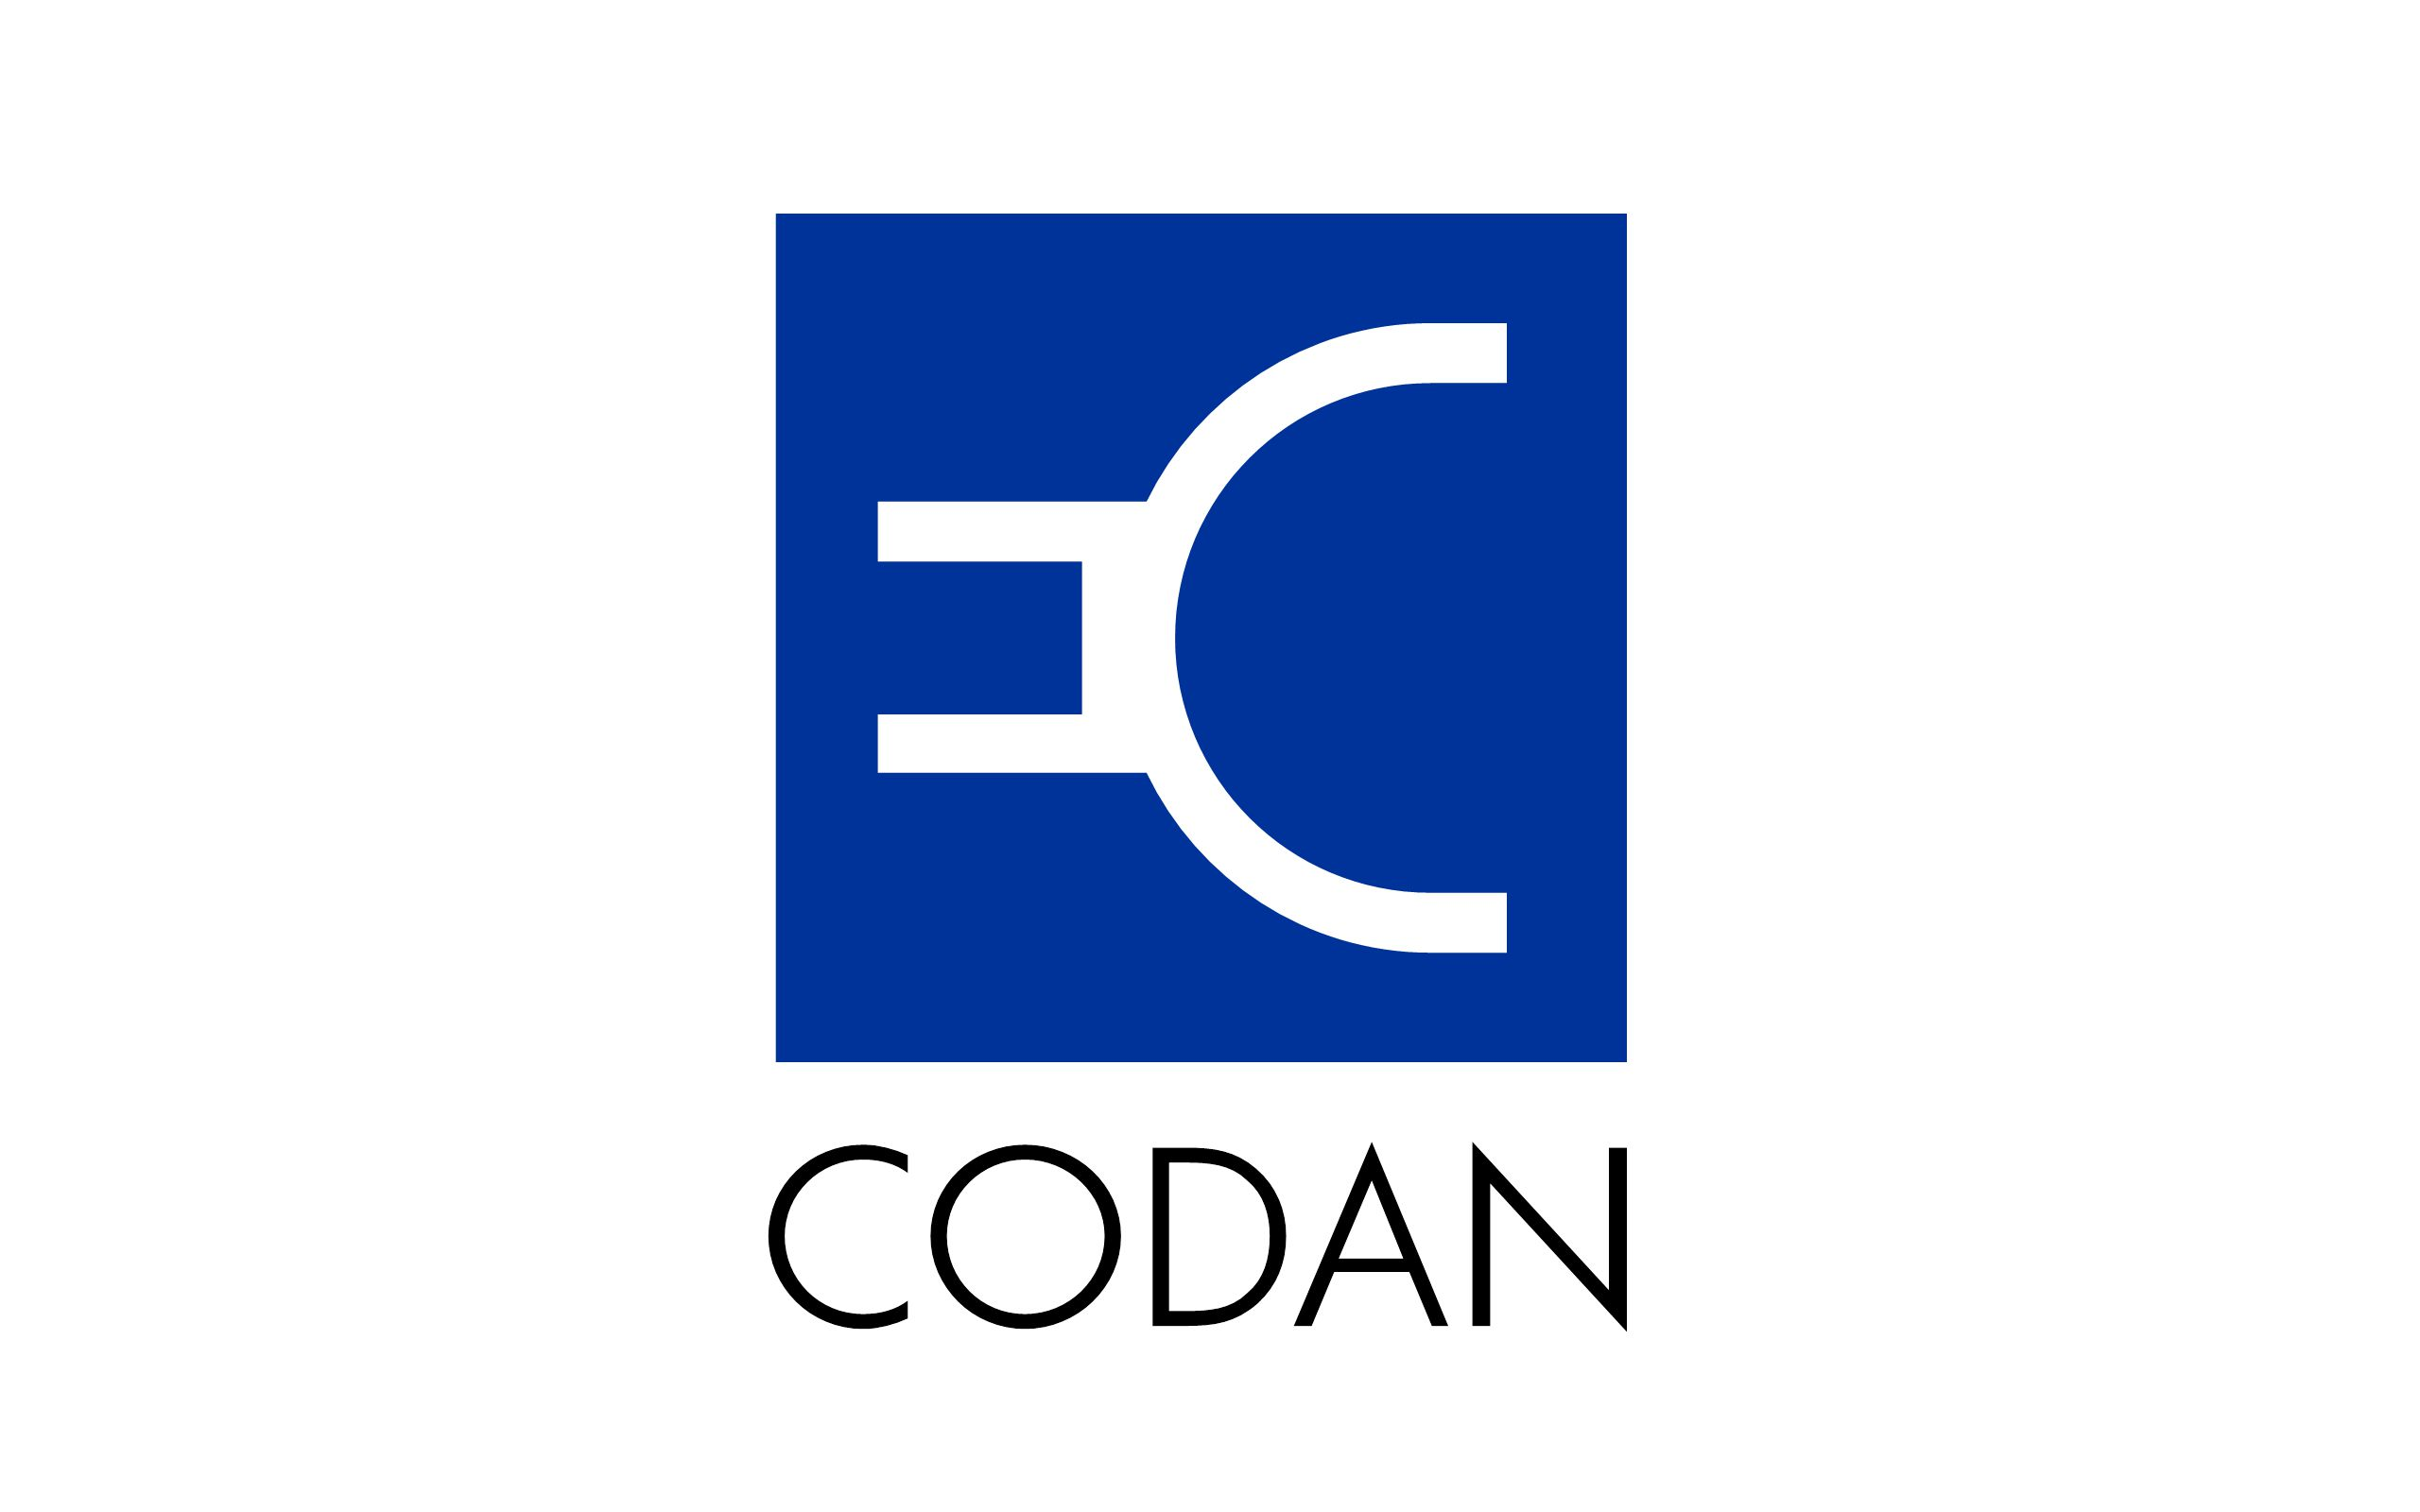 Codan exports approximately 85% of revenue